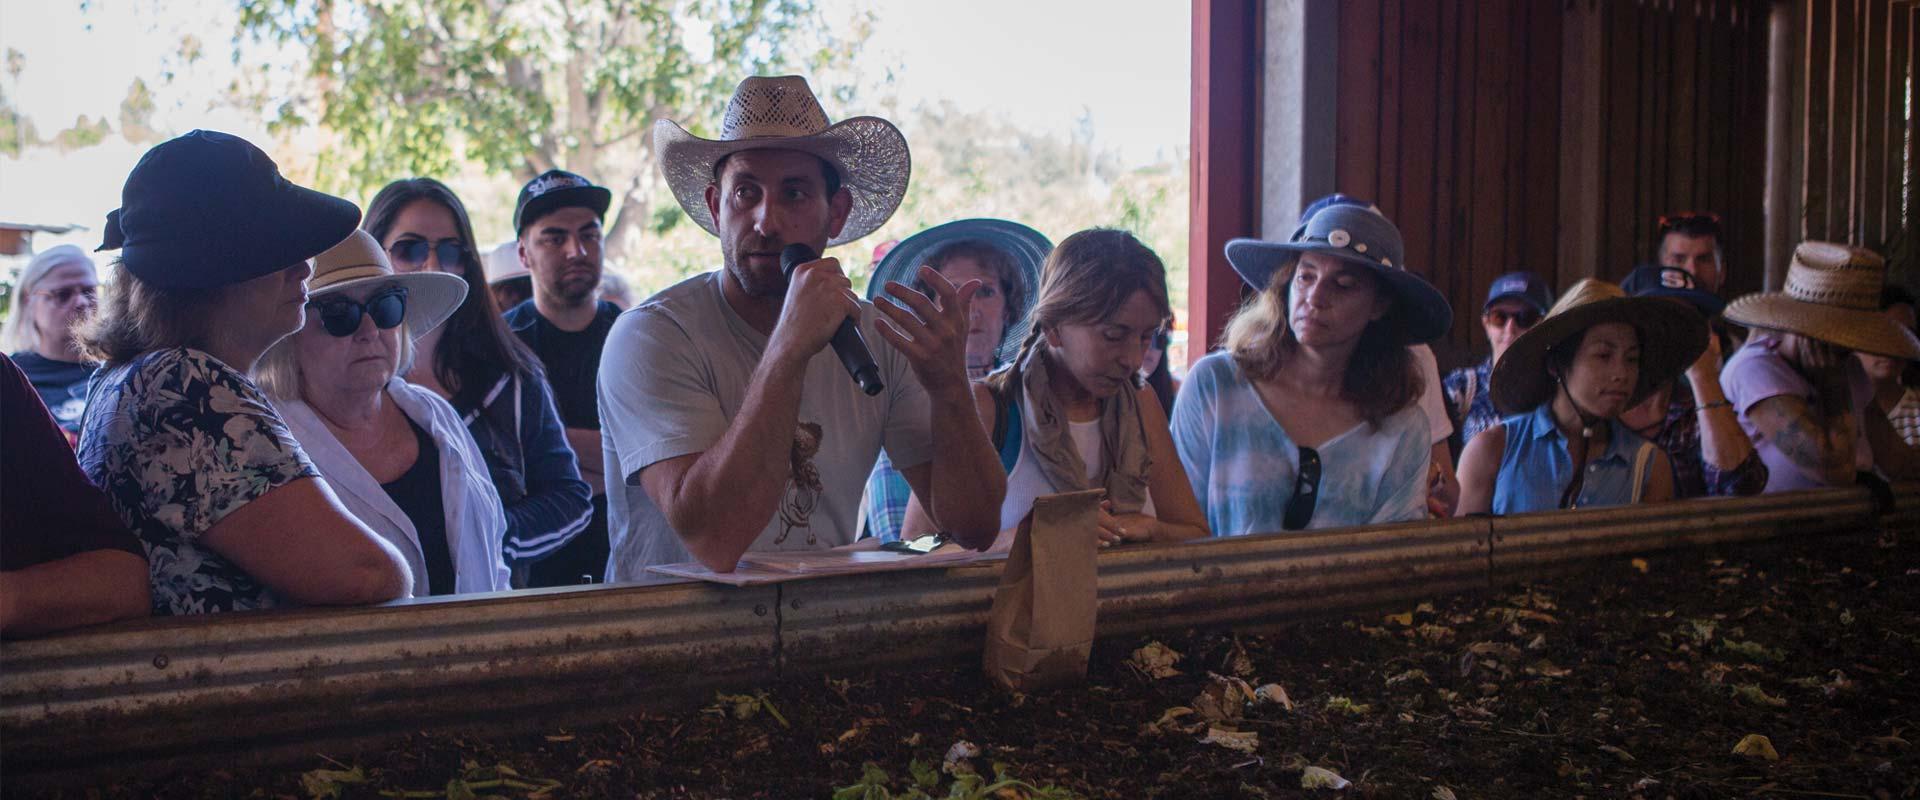 man giving farm tour